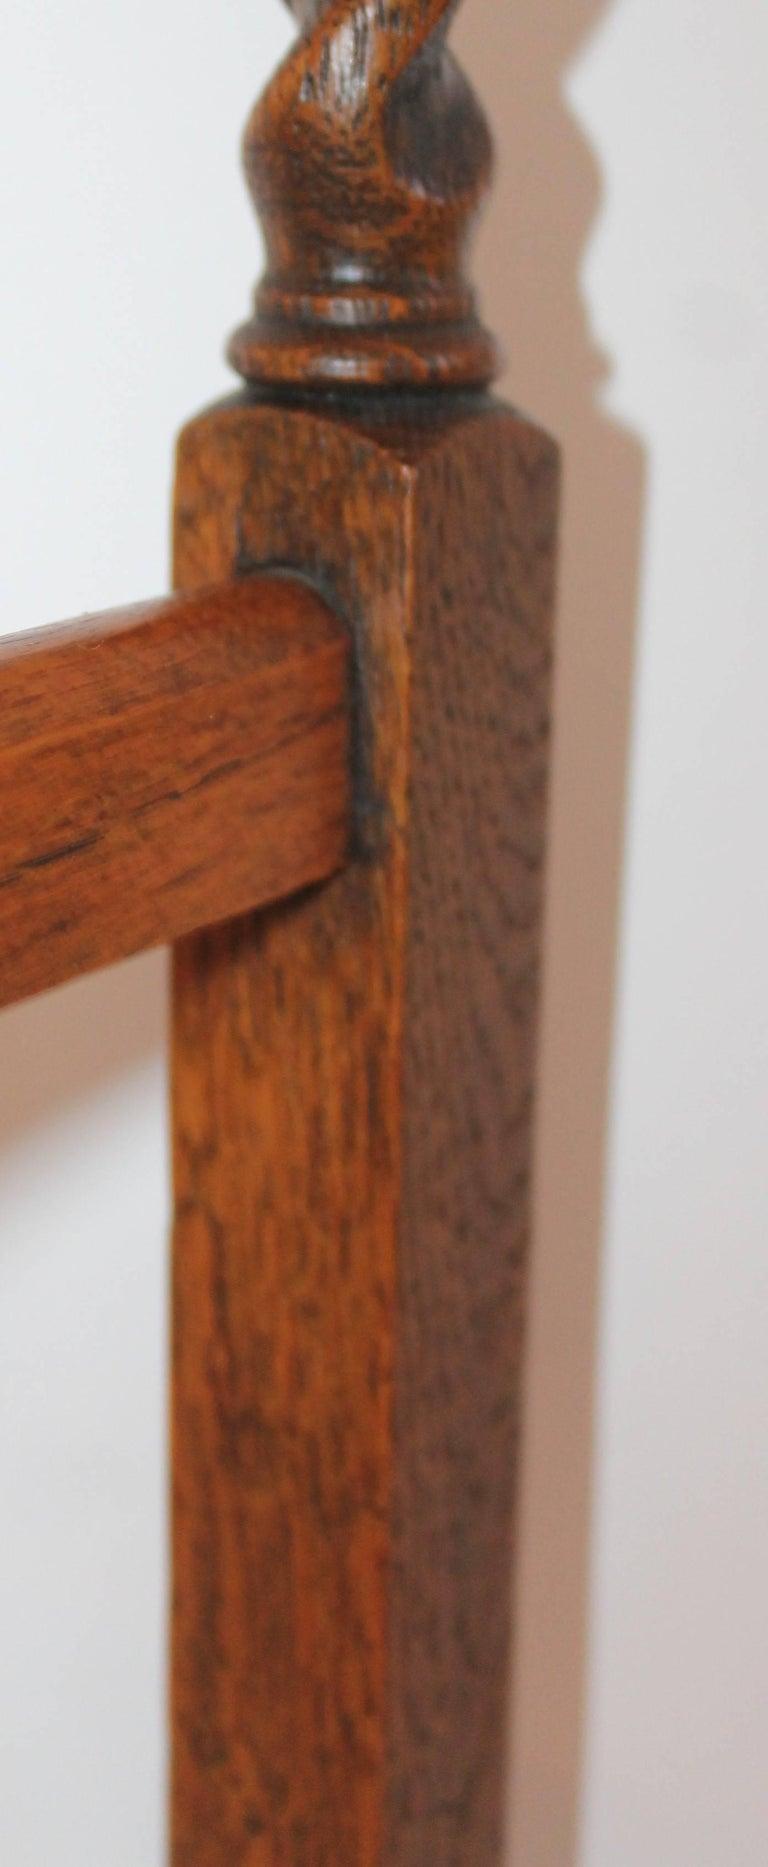 19th Century Oak Quilt Rack in Barley Twist Form 5